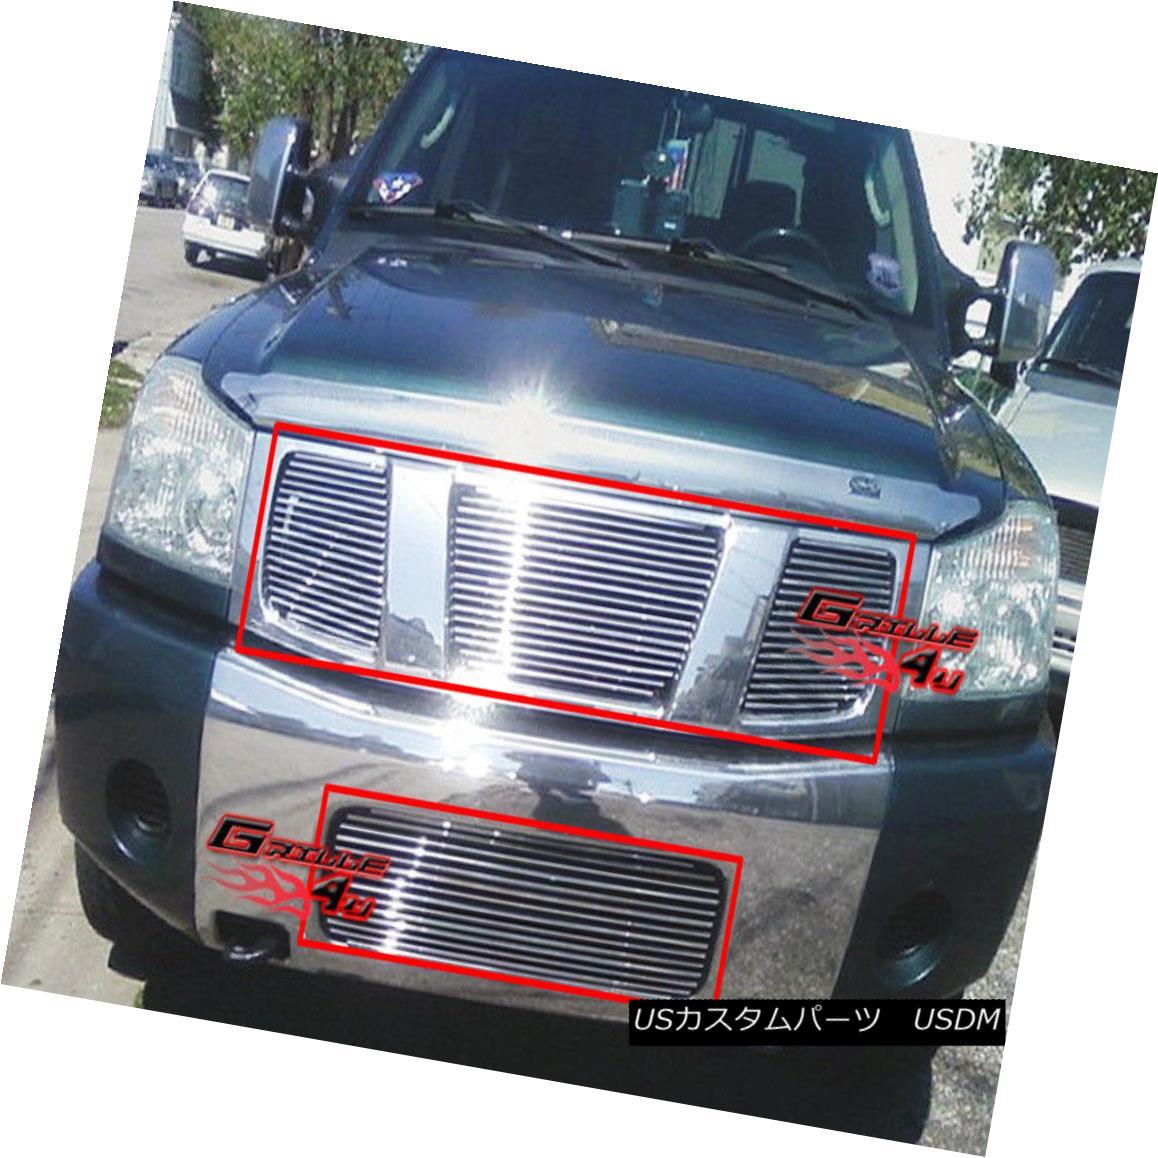 USグリル Fits 2004-2007 Nissan Titan/ Armada Billet Grille Combo 2004-2007 Nissan Titan / Armada Billet Grille Comboに適合